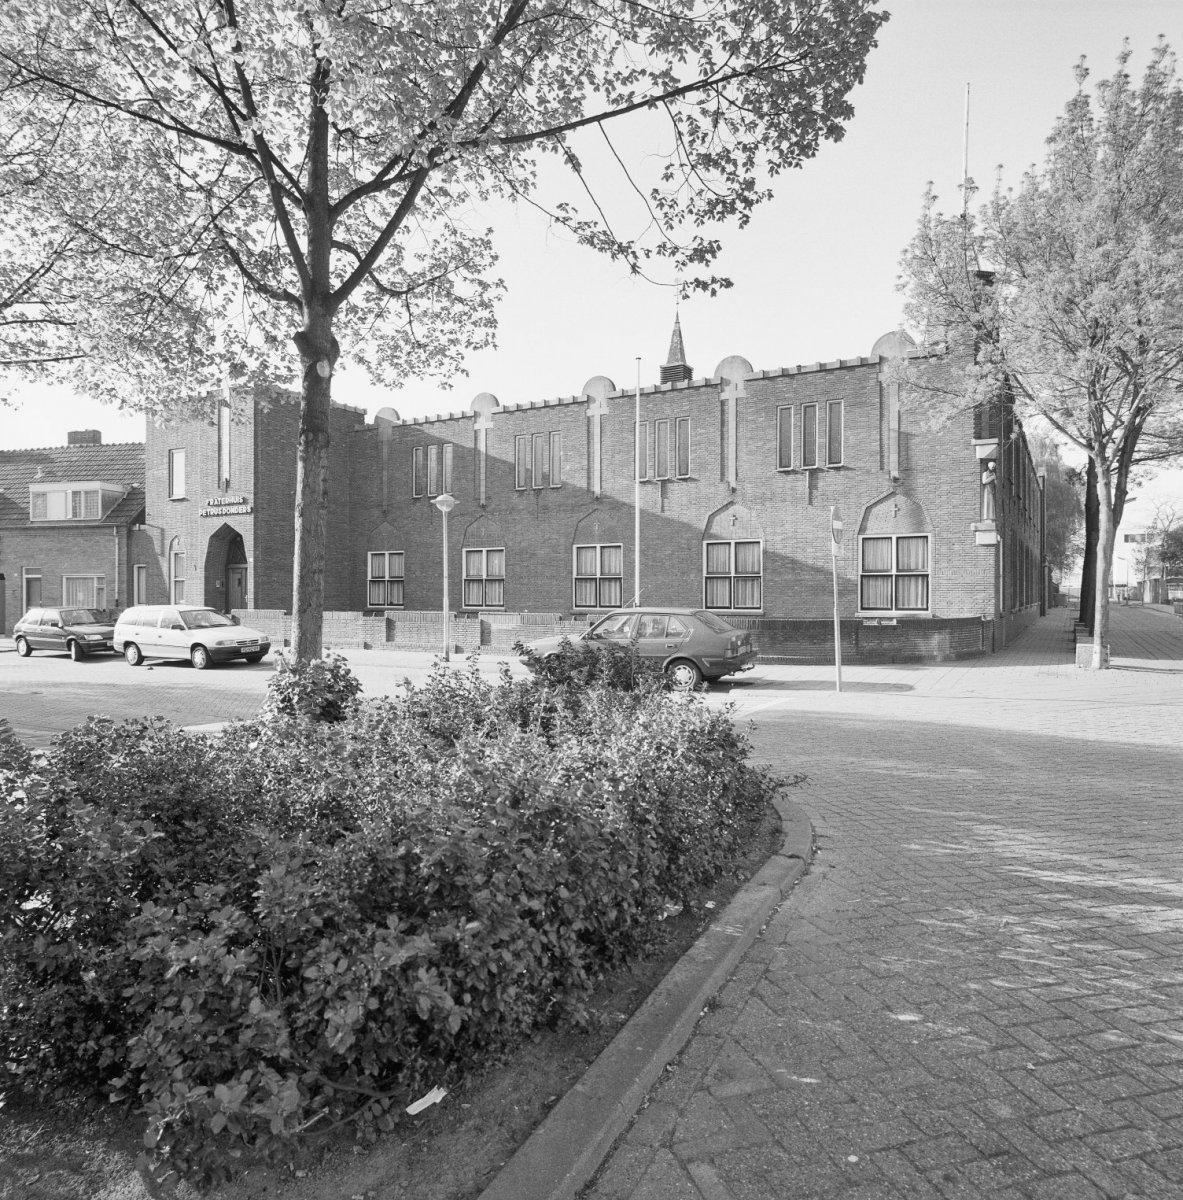 Fraterhuis petrus donders wikipedia - Expressionistische architectuur ...